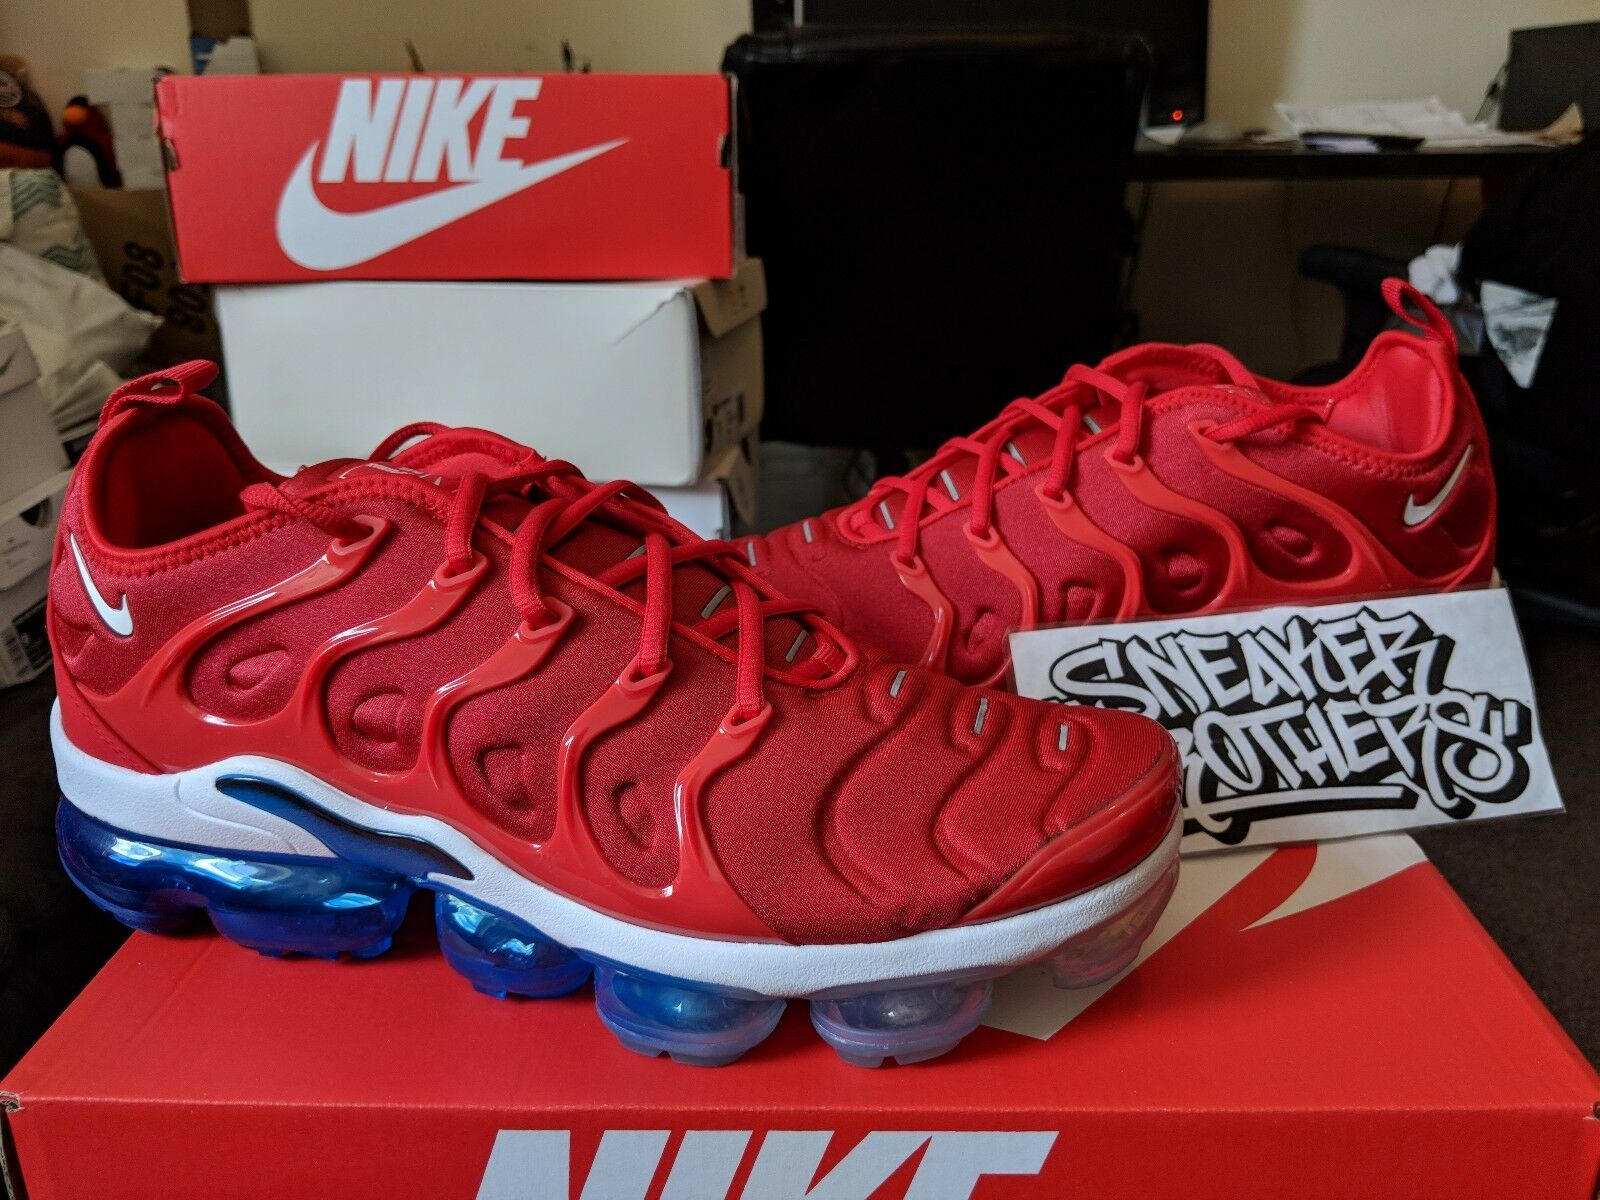 Nike Air Vapormax Plus USA University Red White Photo bluee Black July 924453-601